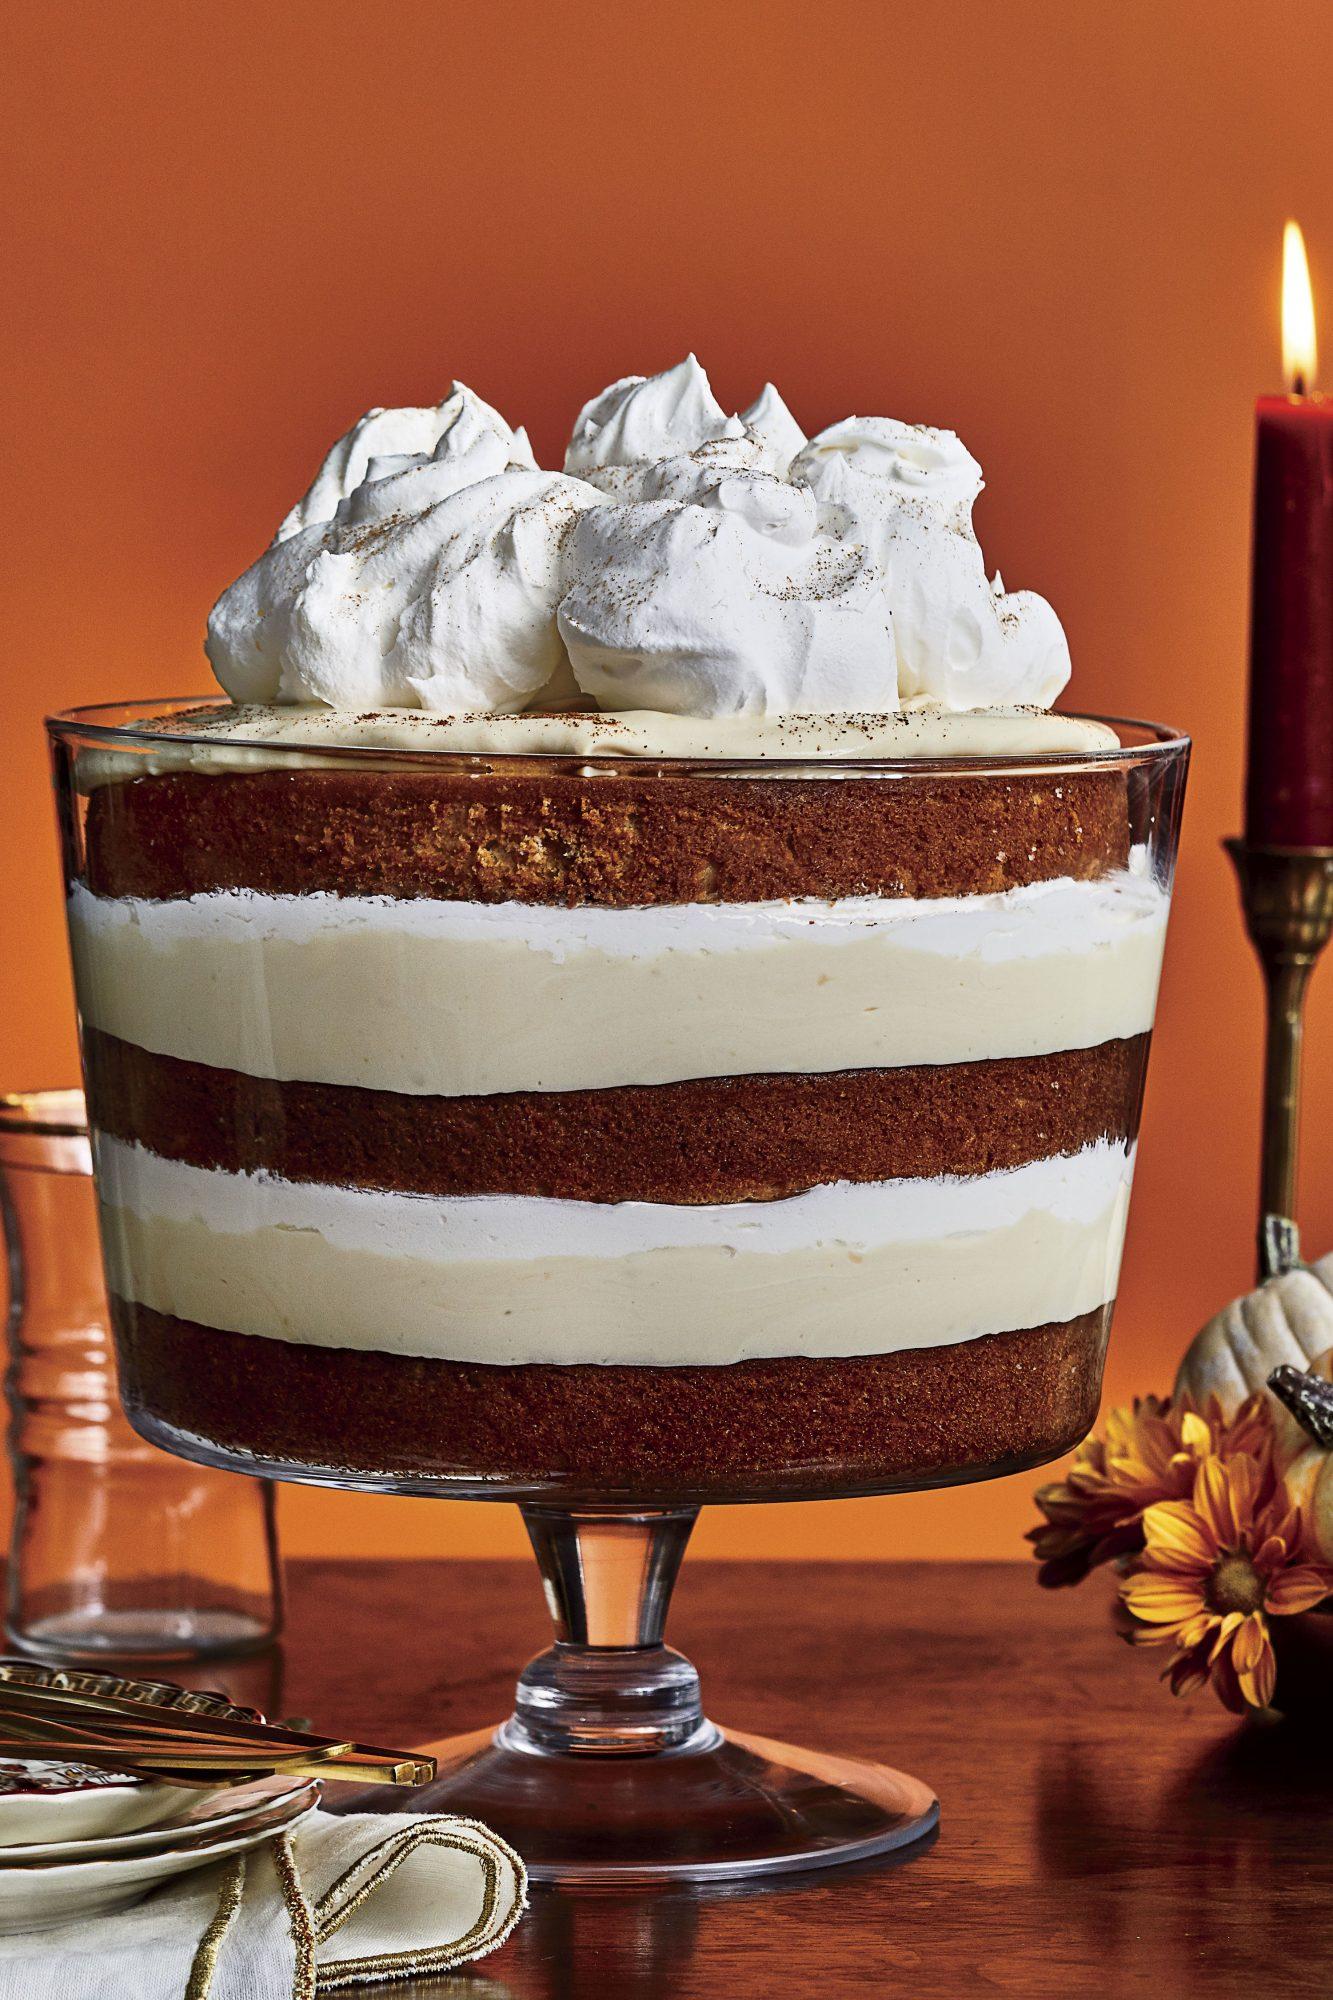 Butterscotch-Spice Trifle